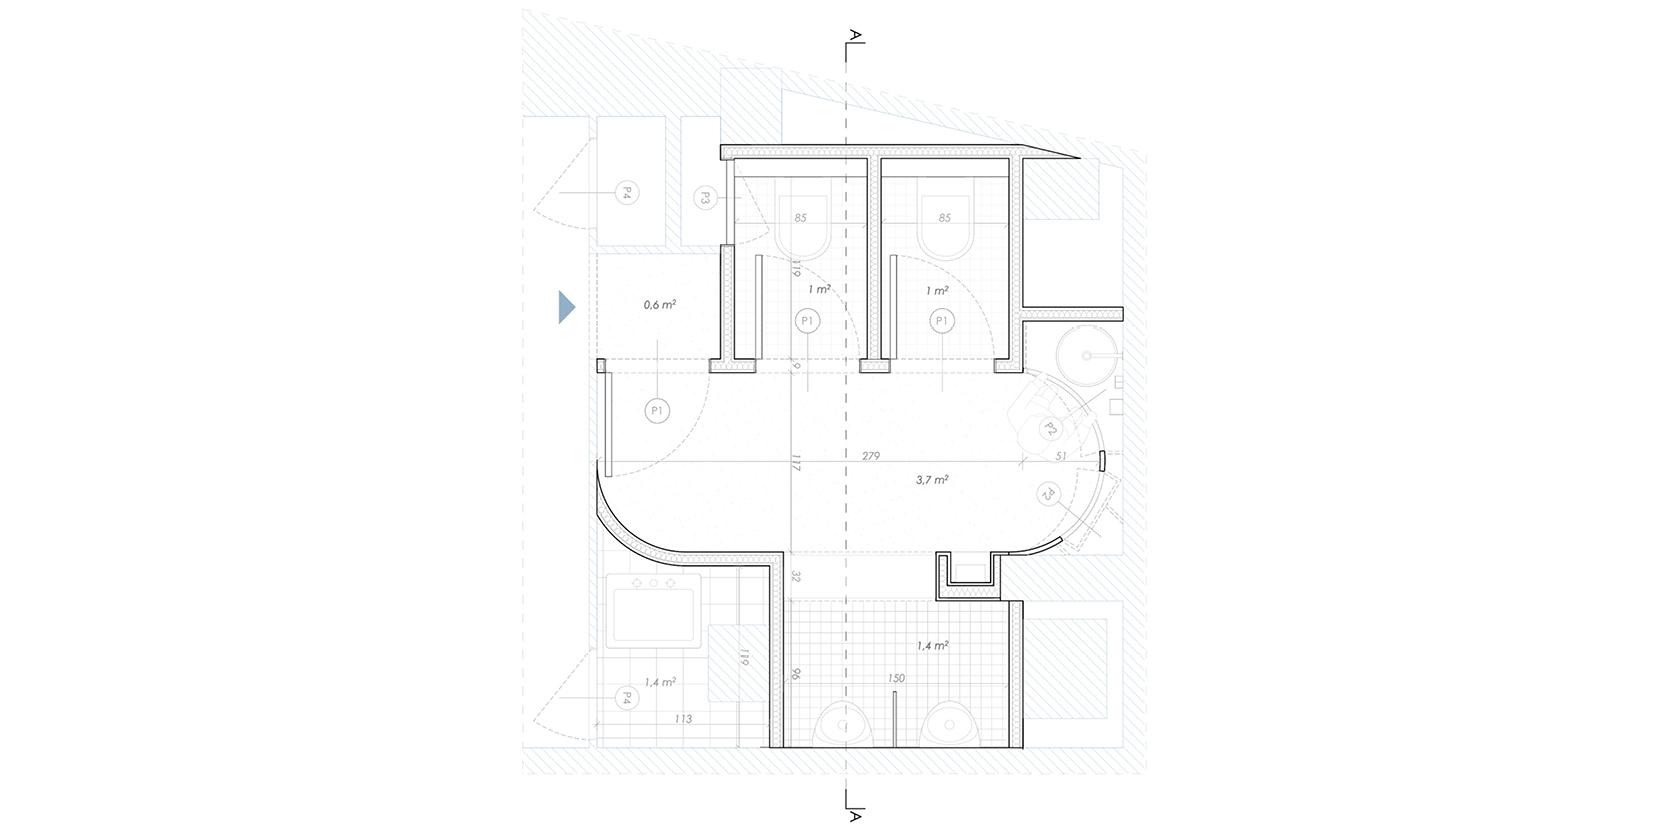 Reforma lavabos estadistica IDESCAT OCA Architects Arquitectura architecture interior design disseny interior Hernan Lleida Bernardo Garcia6